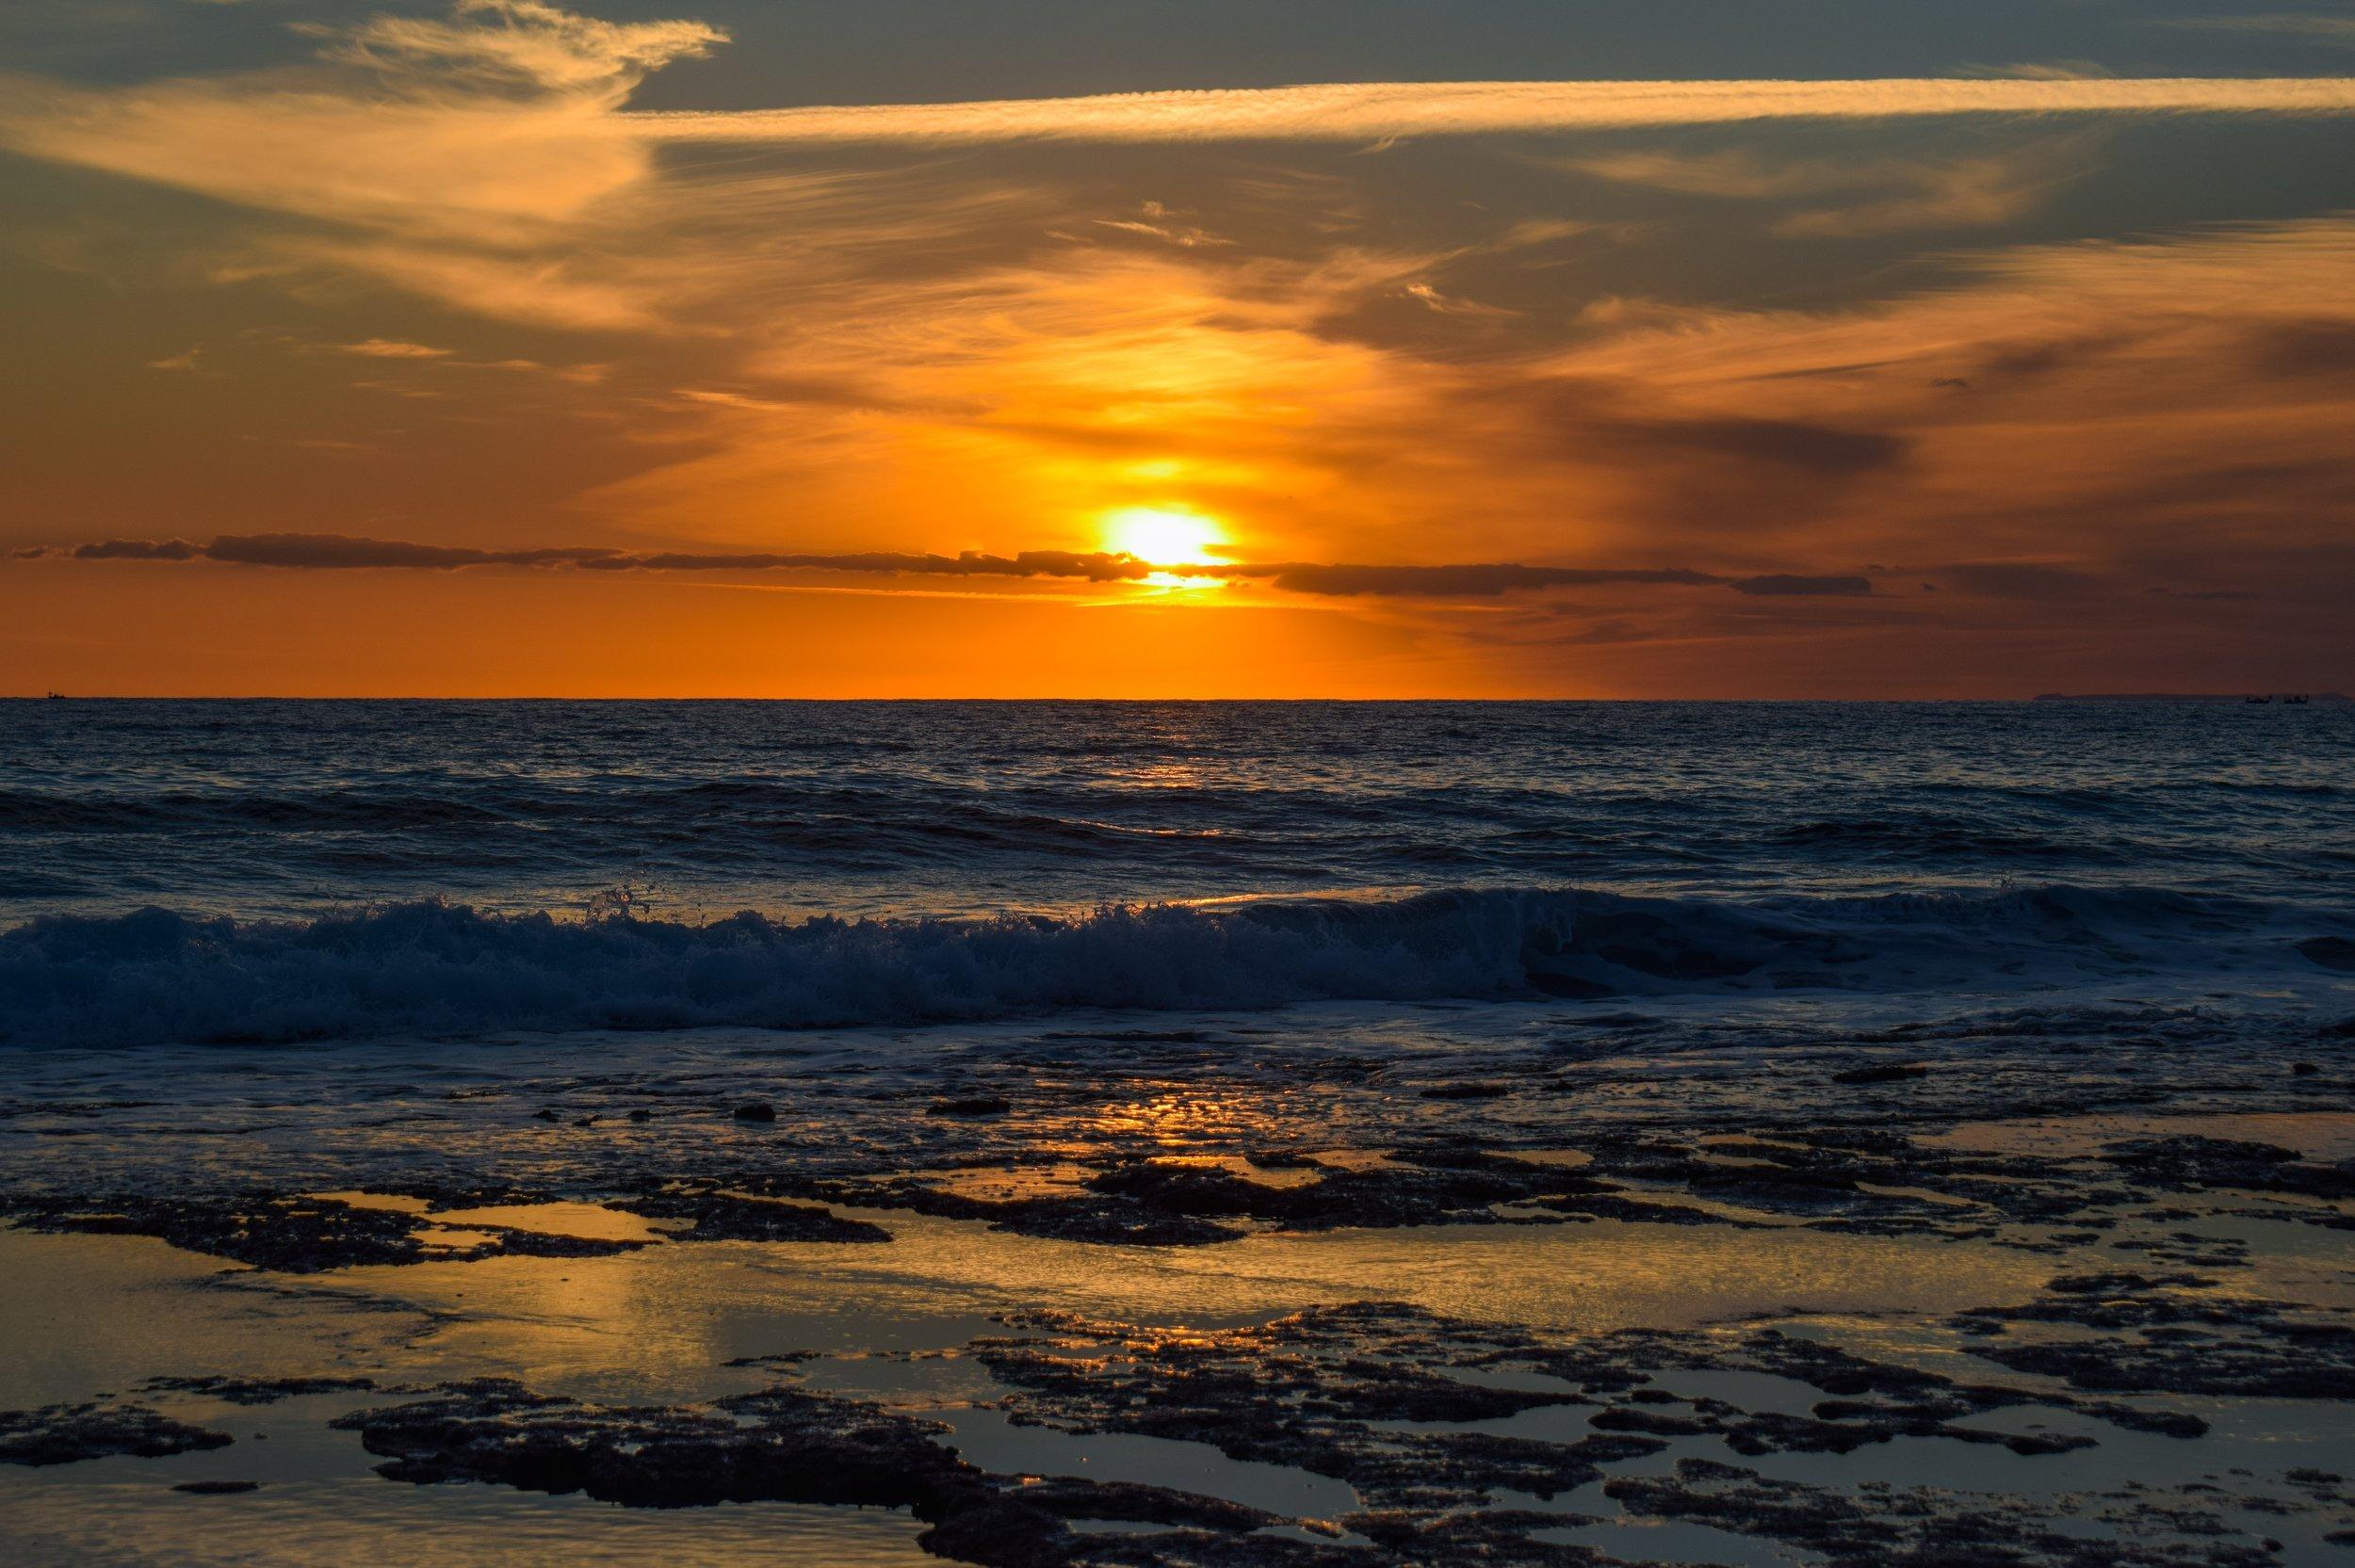 sunset-4047297.jpg